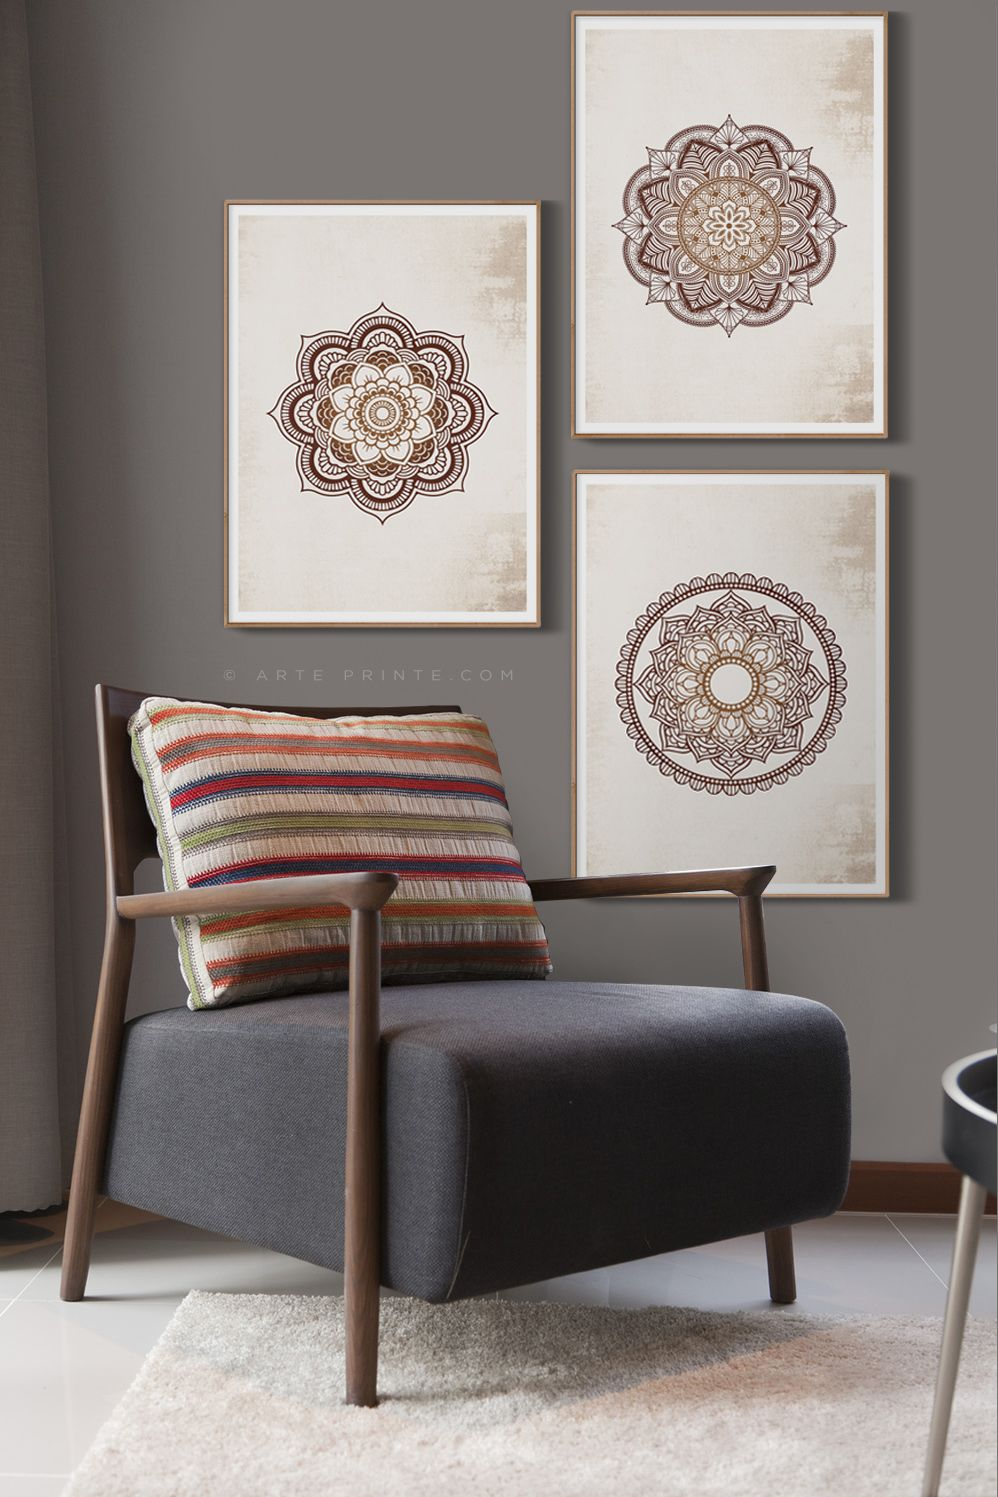 Original Brown Mandala Wall Art Printable Set Of 3 Prints Etsy Wall Decor Living Room Wall Decor Bedroom Wall Decor Printables